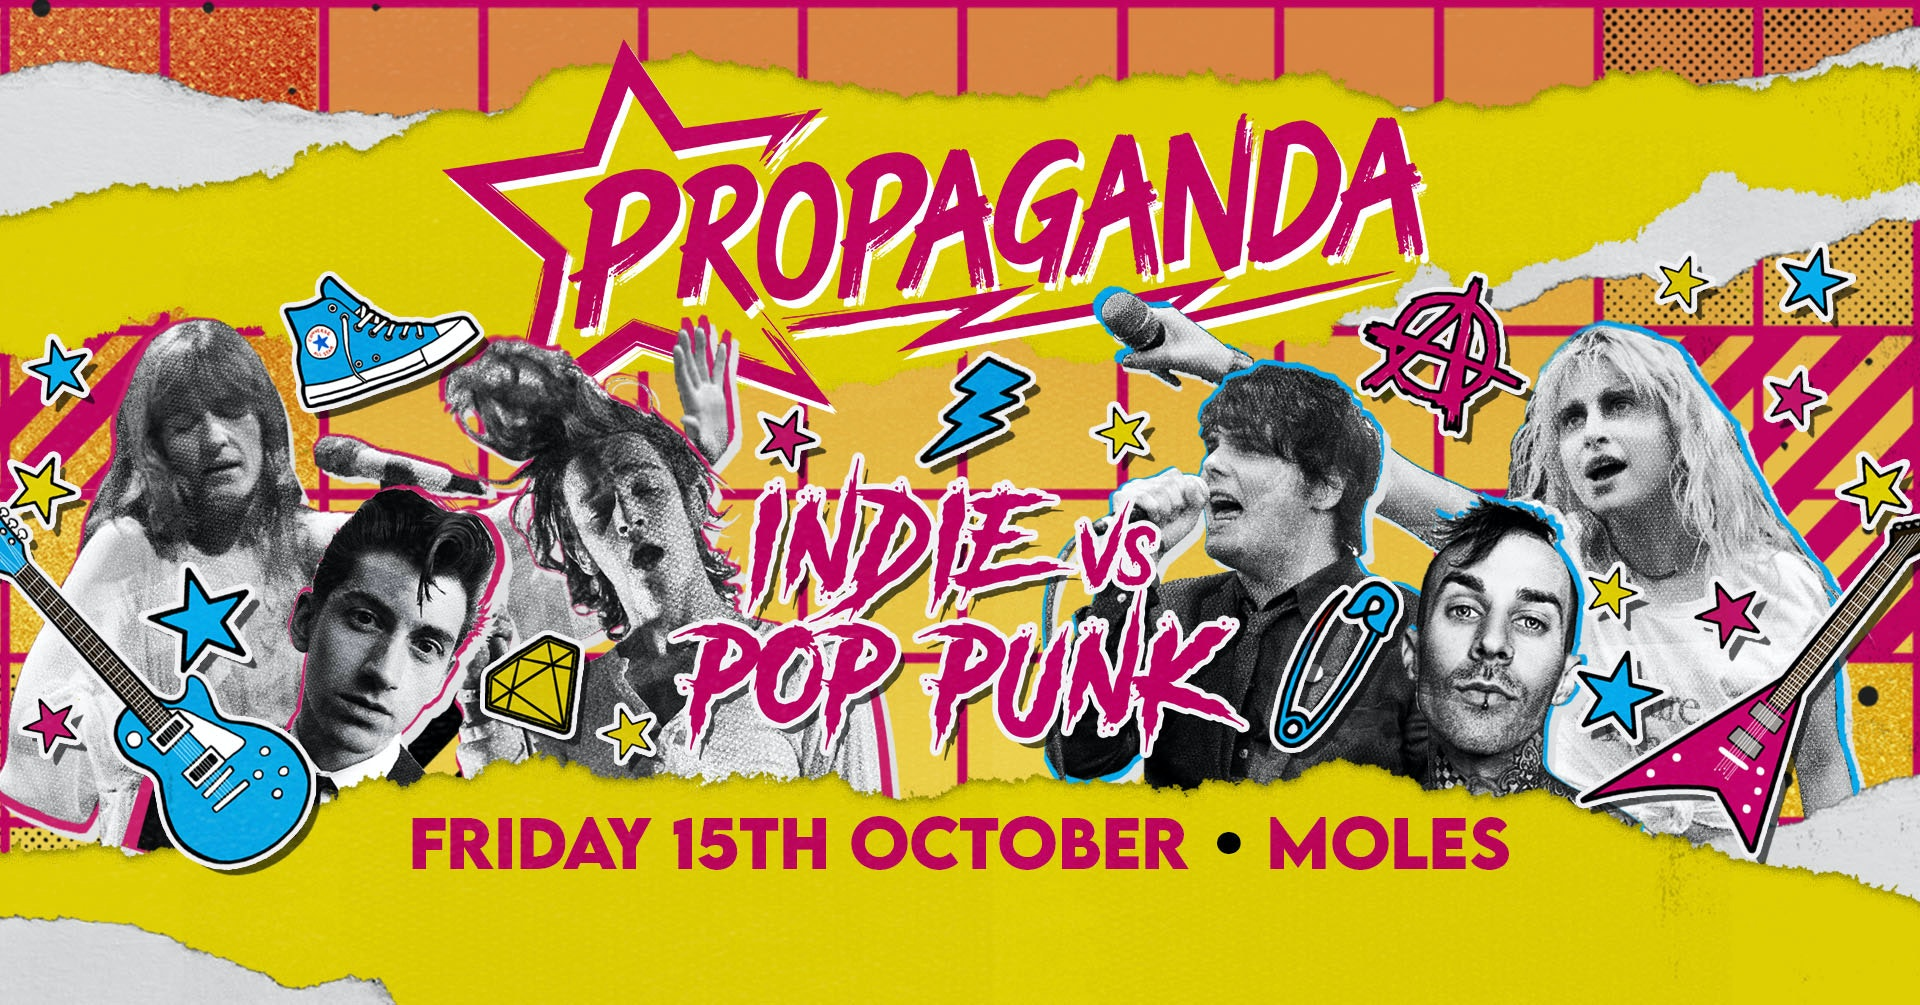 Propaganda Bath – Indie vs Pop-Punk!